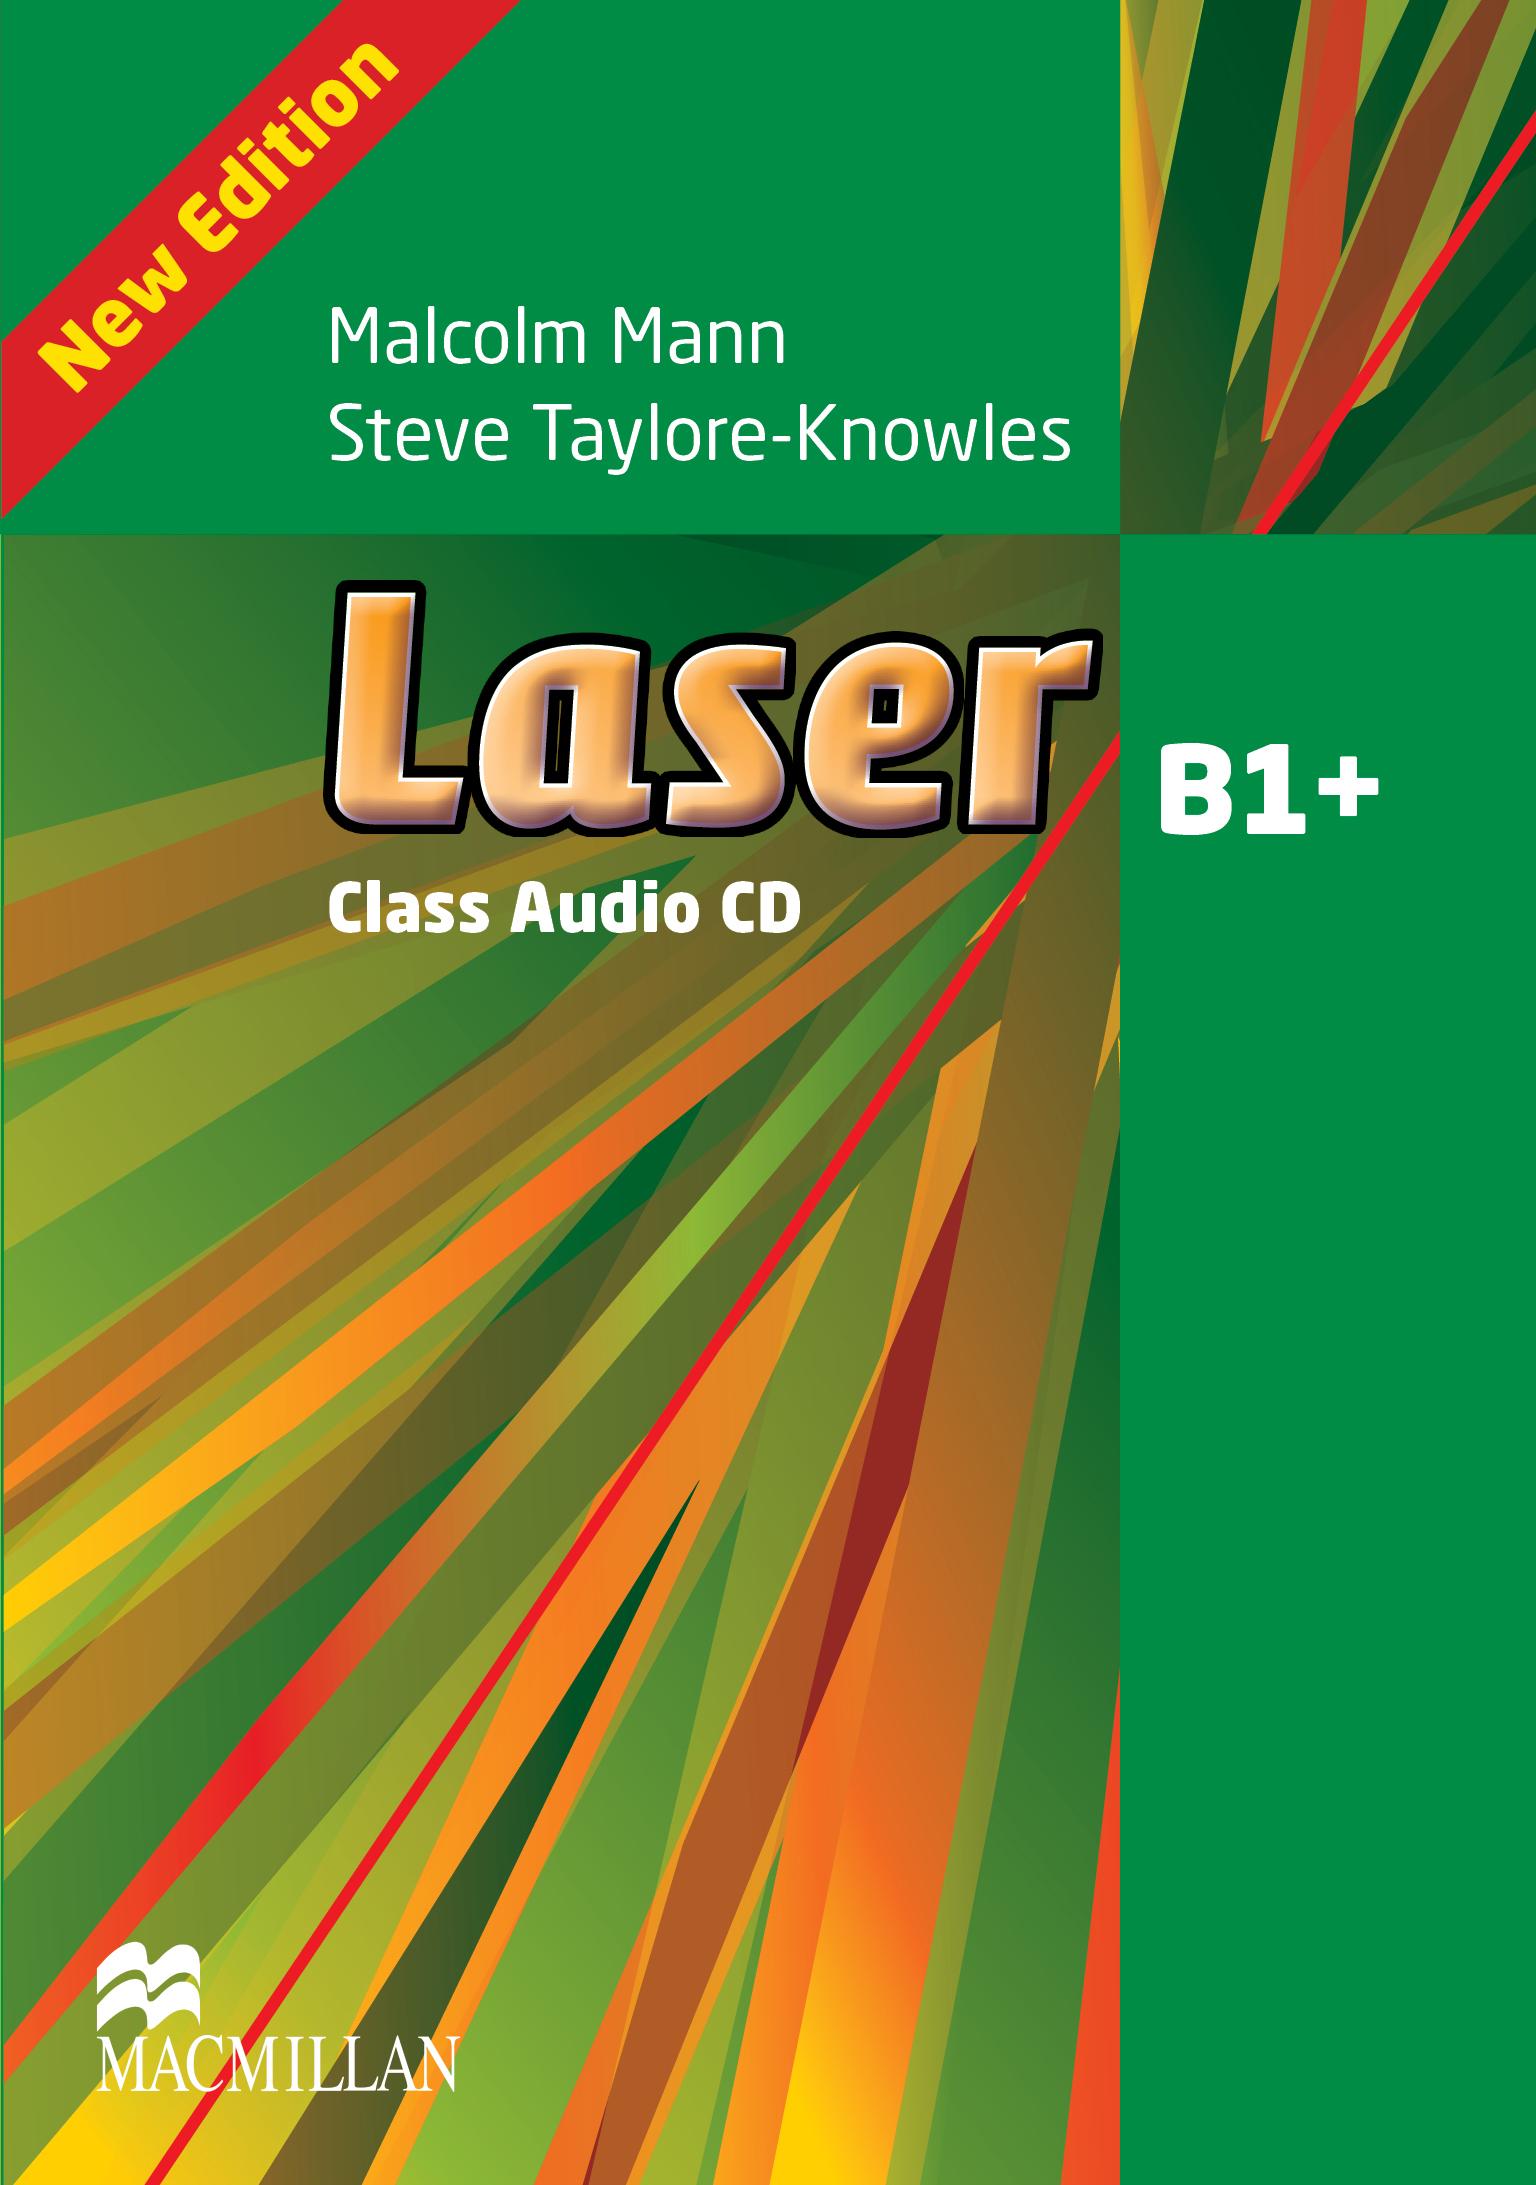 Laser B1+ Third Edition Class Audio CDx2